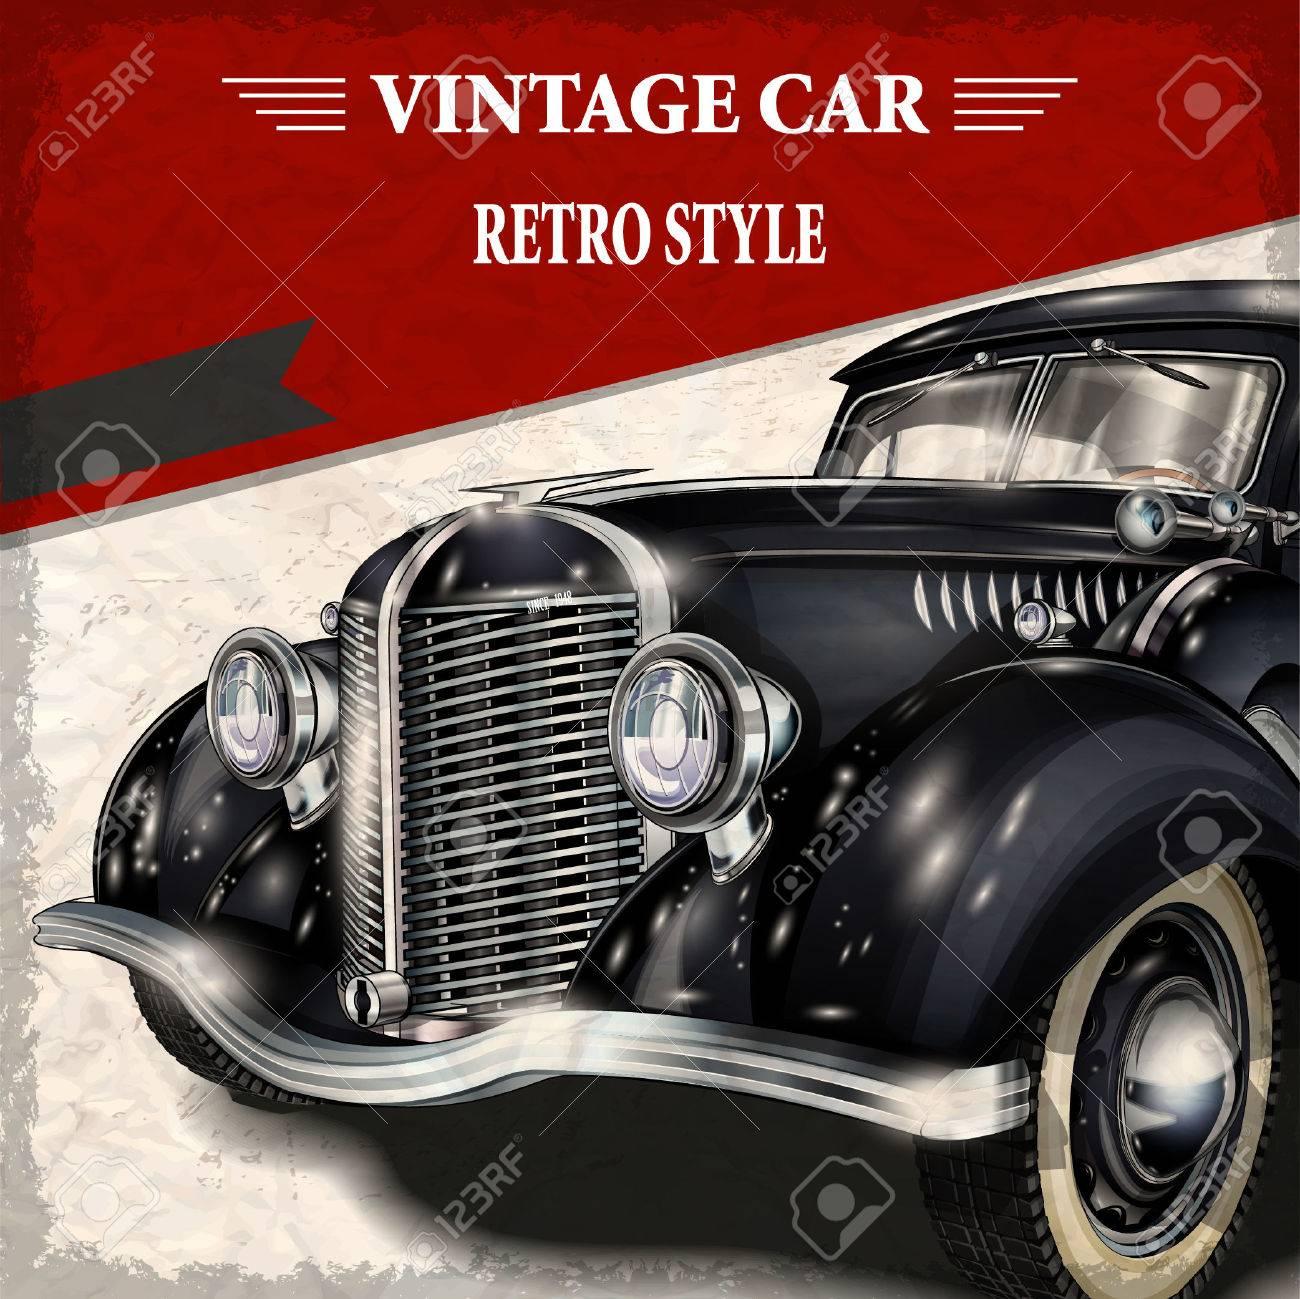 Vintage car - 52512414